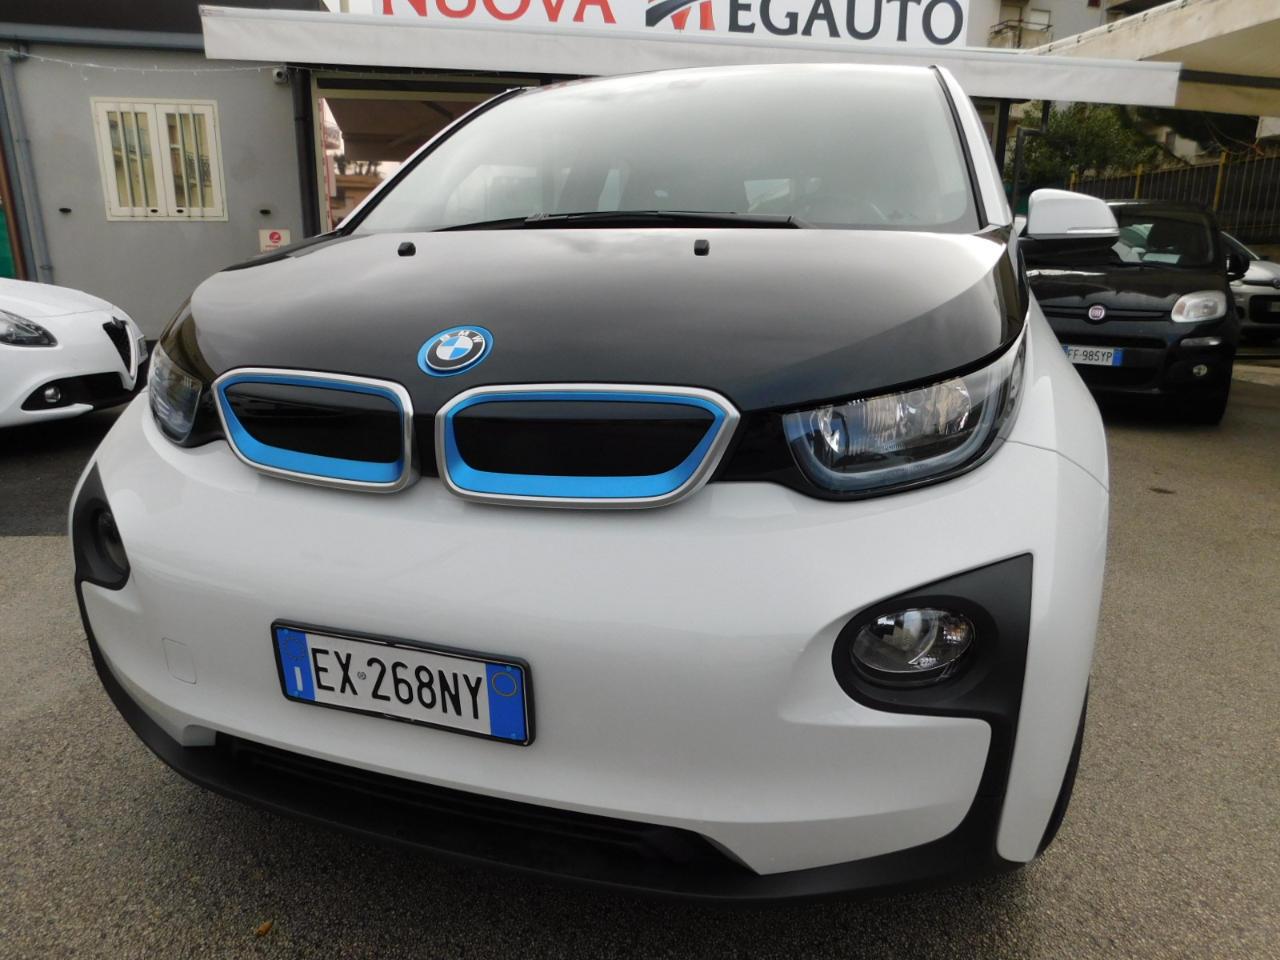 BMW I3 Elettrica